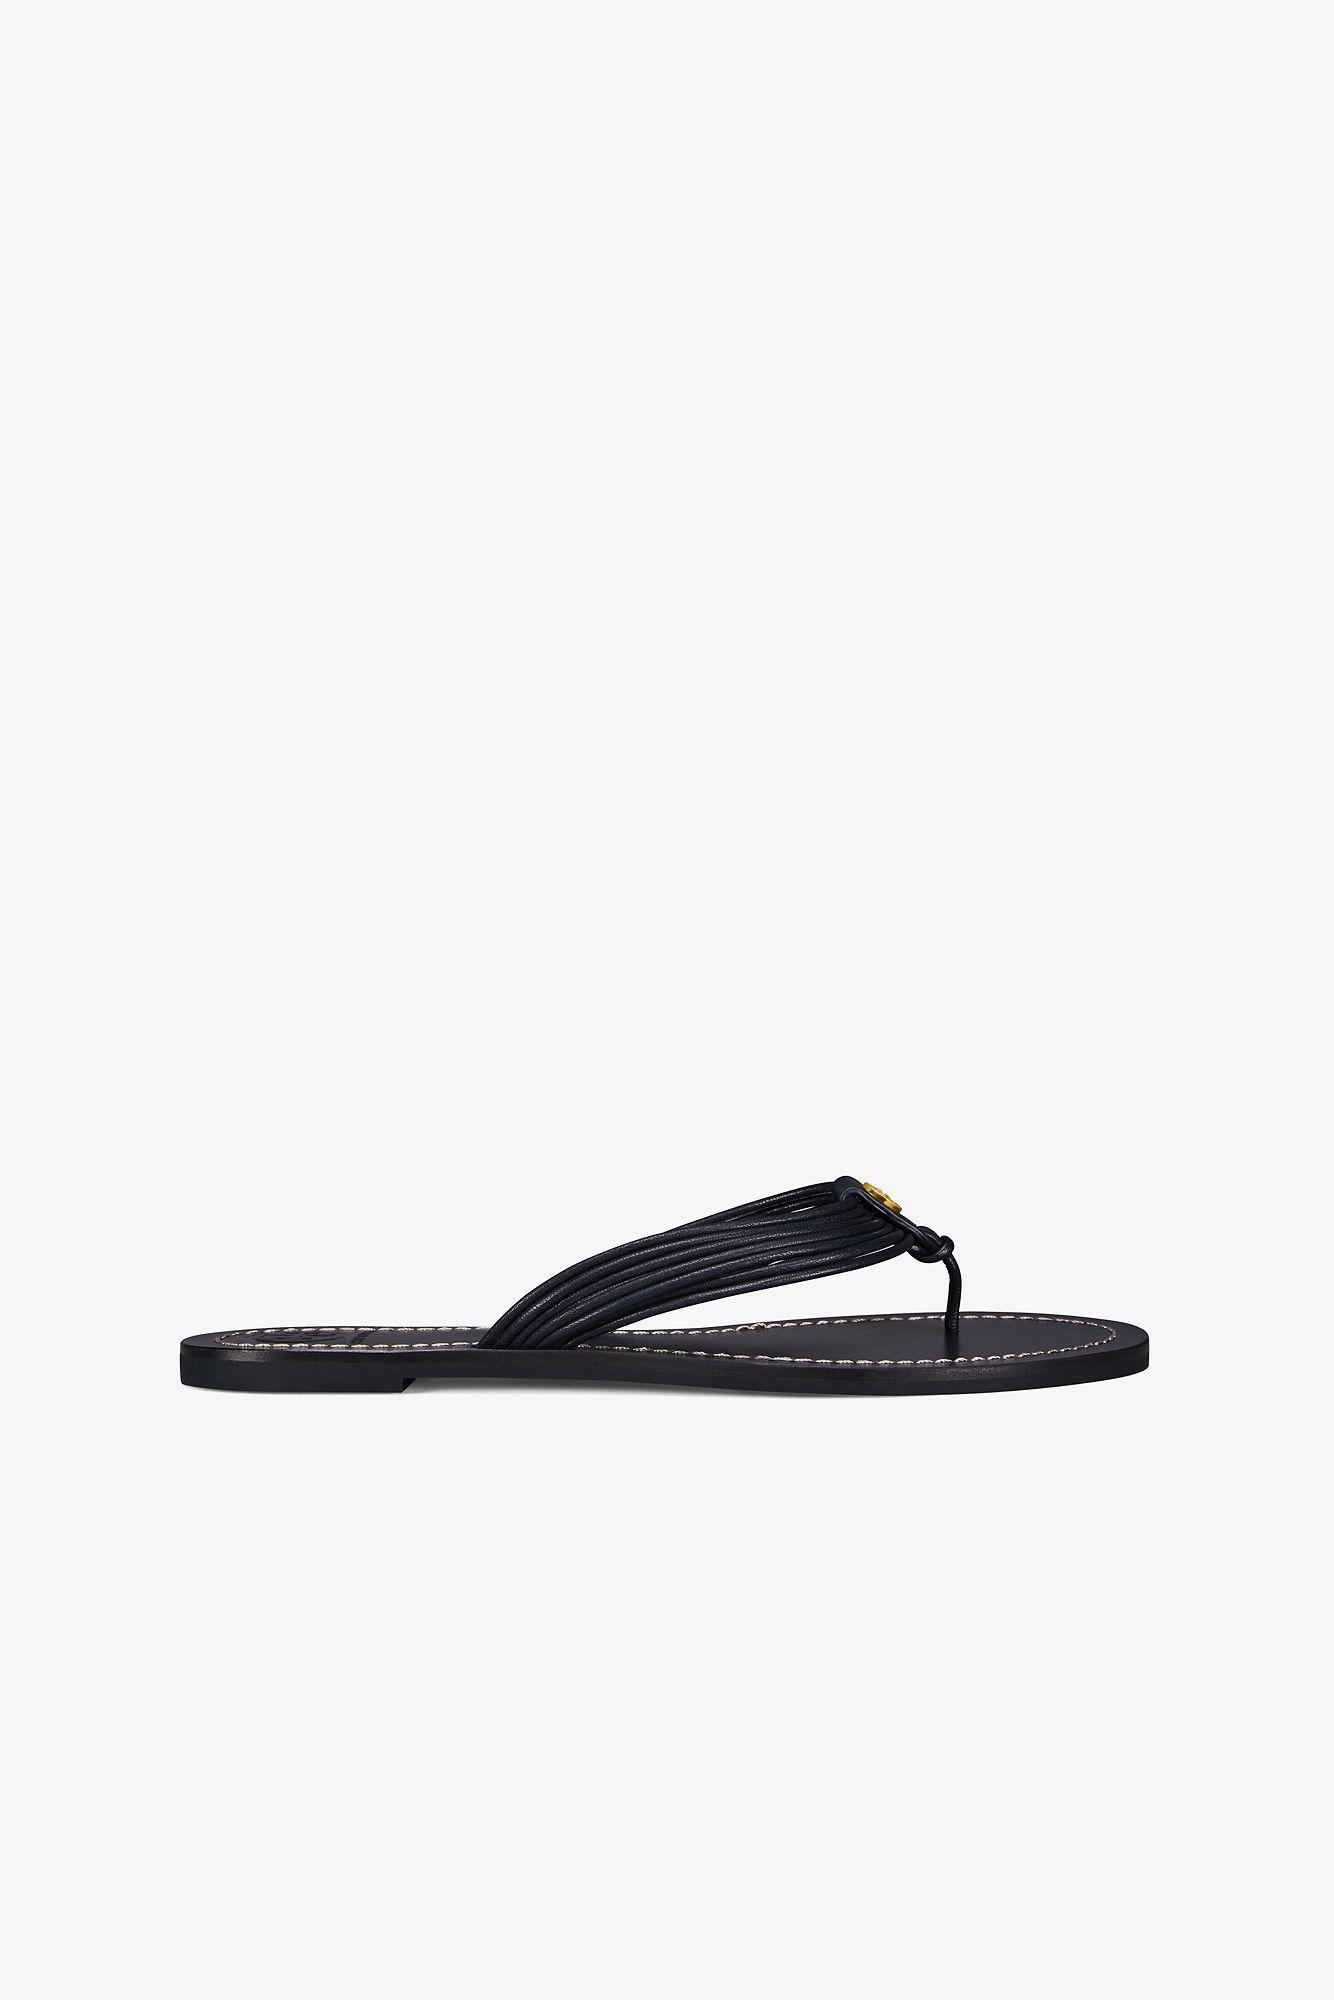 9520b72d903 Lyst - Tory Burch Sienna Flat Thong Sandal in Blue